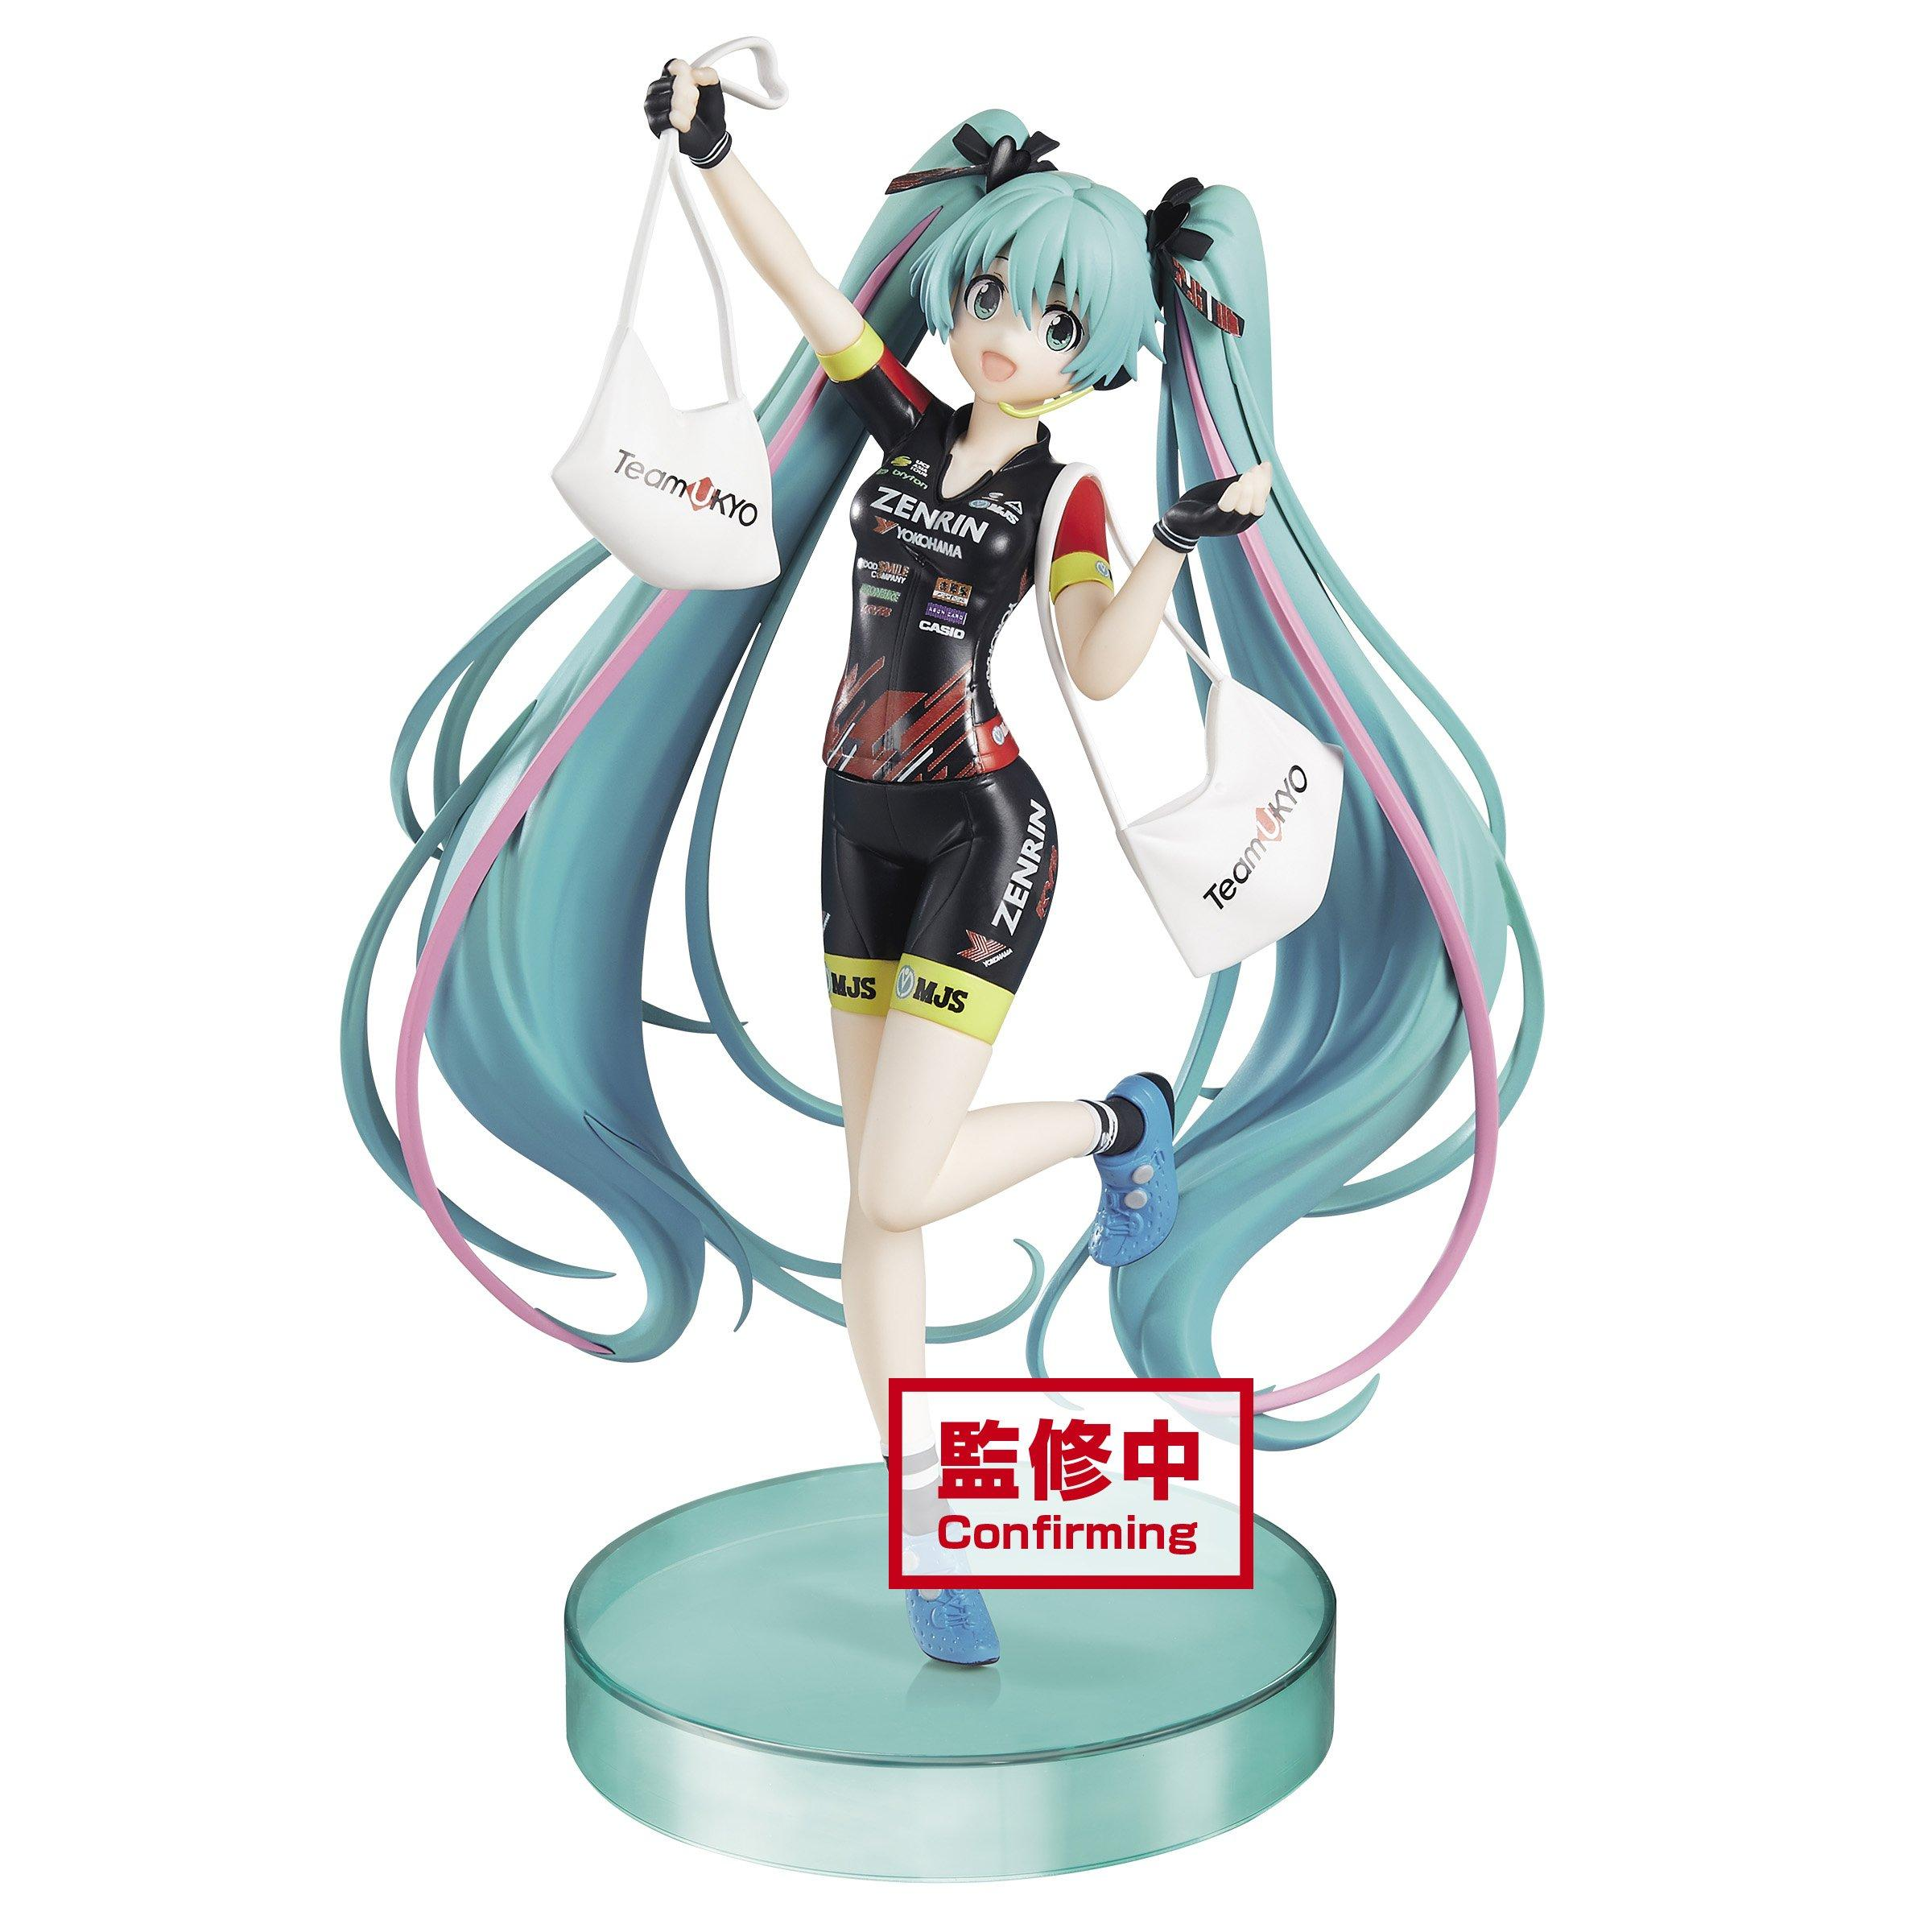 Vocaloid Hatsune Miku ESPRESTO est Figure Toy Racing Miku 2019 Team UKYO BP81917